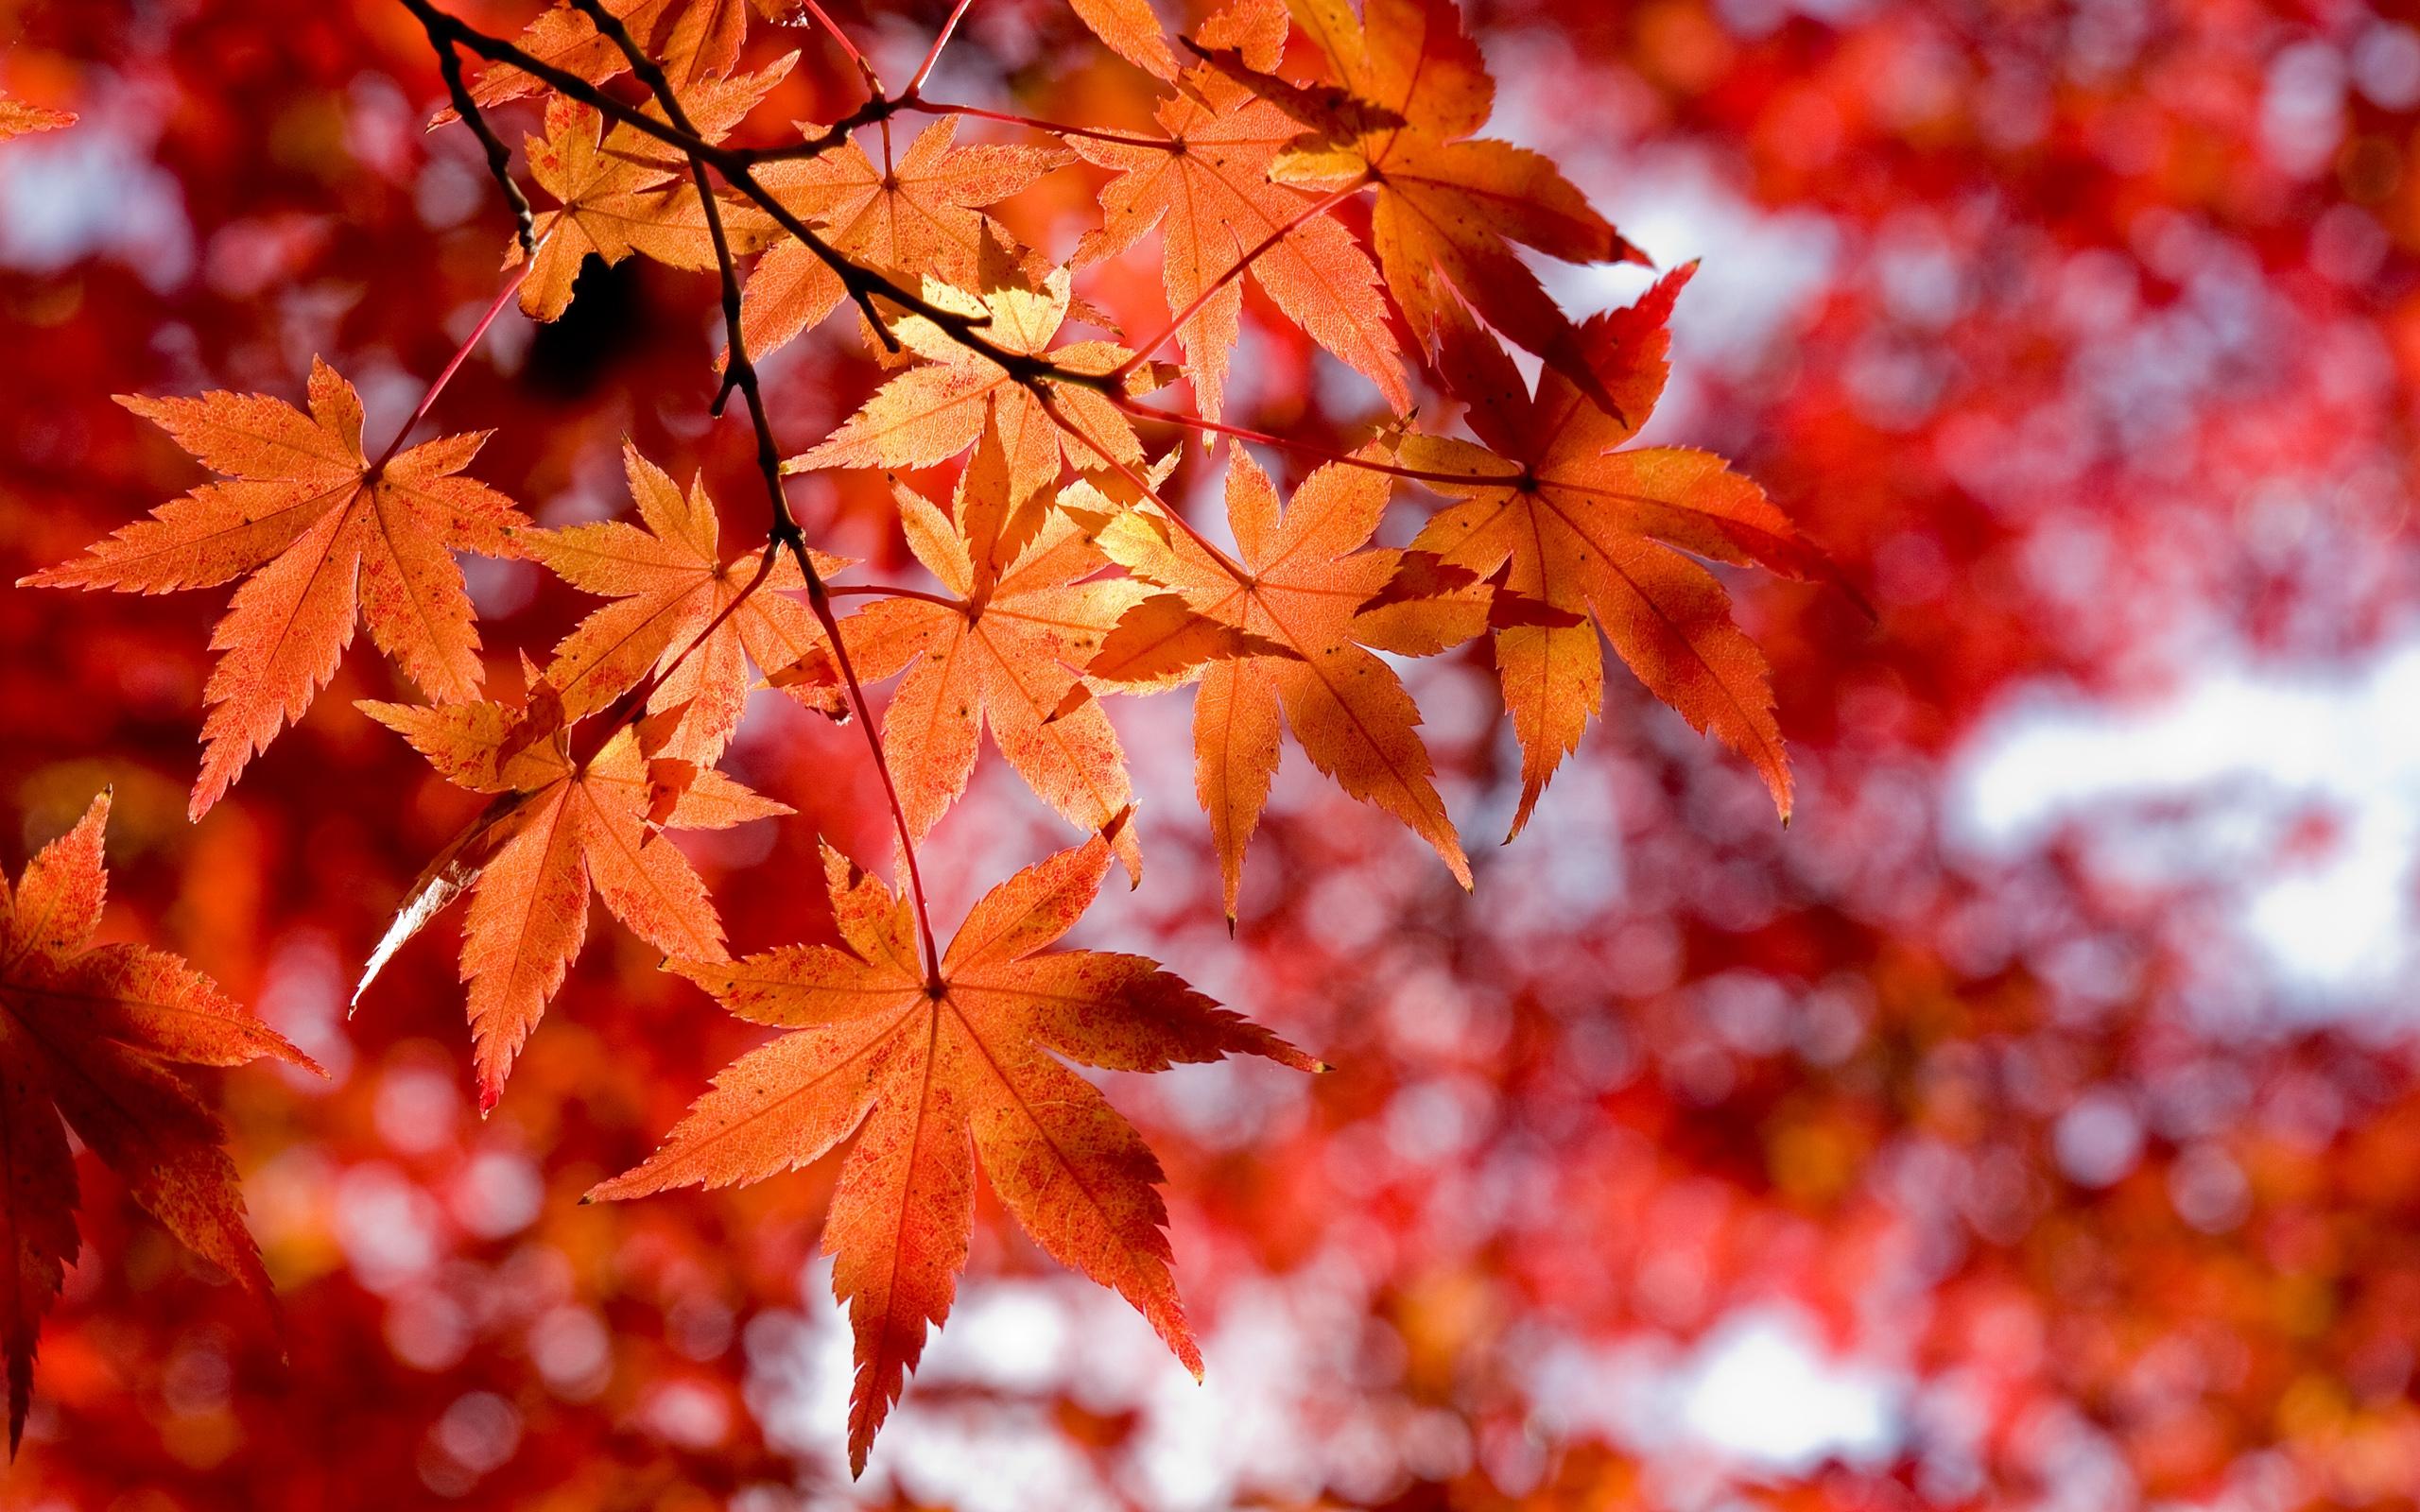 Forumwerbung - Seite 5 Nature_Seasons_Autumn_Red_Maple_Leaves_034857_